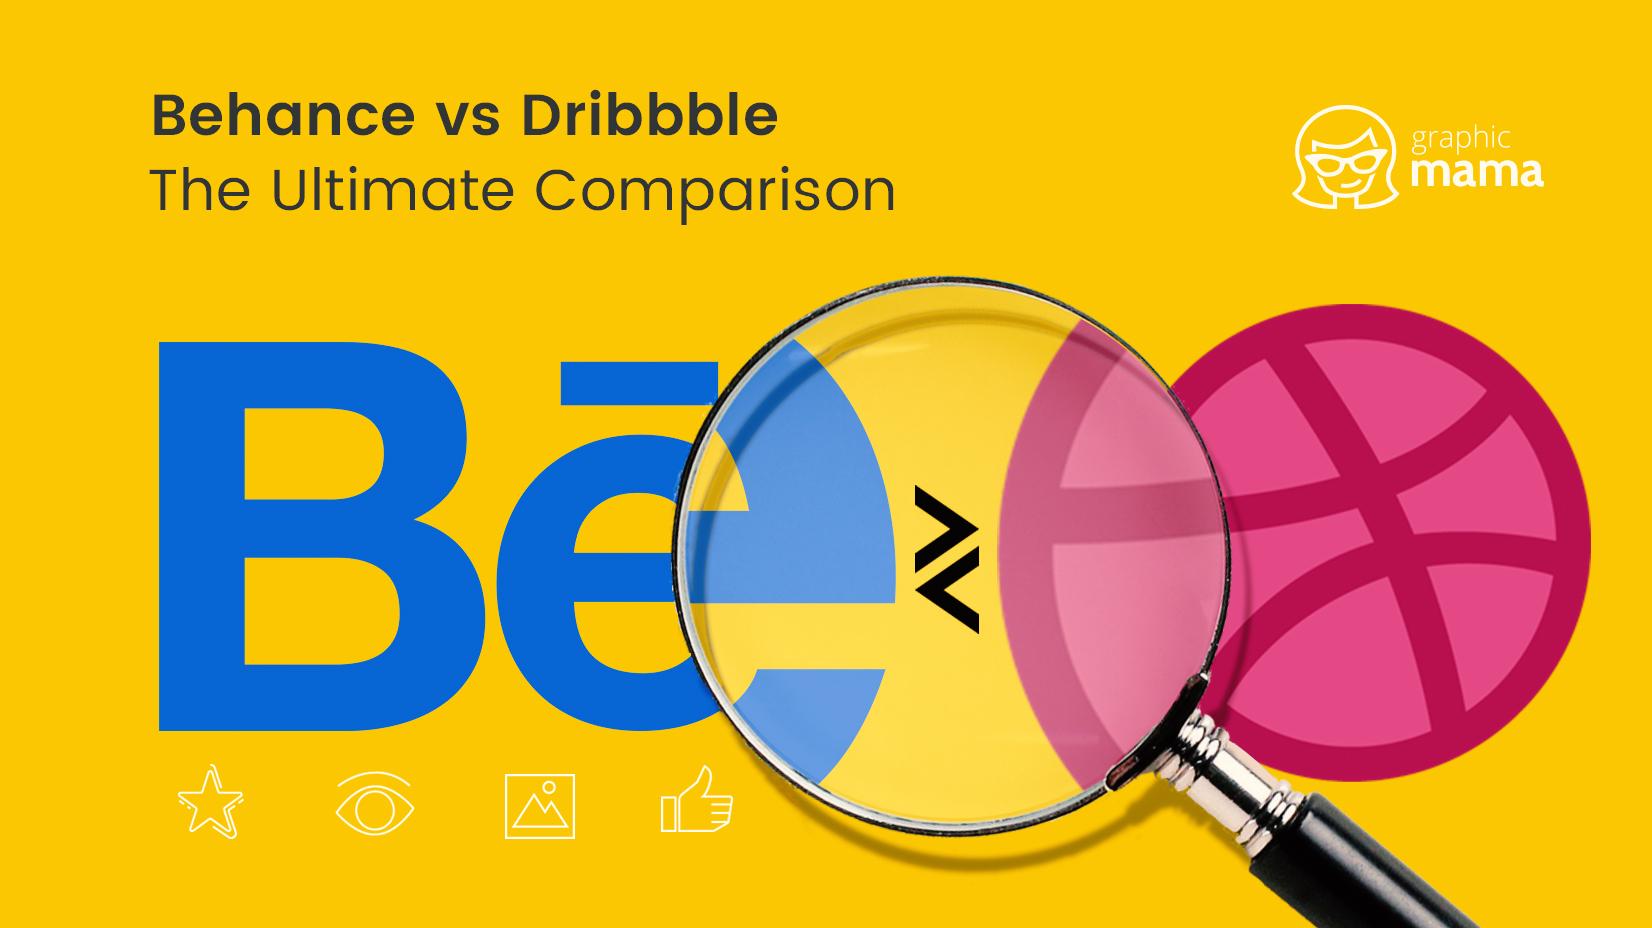 Behance vs Dribbble: The Ultimate Comparison